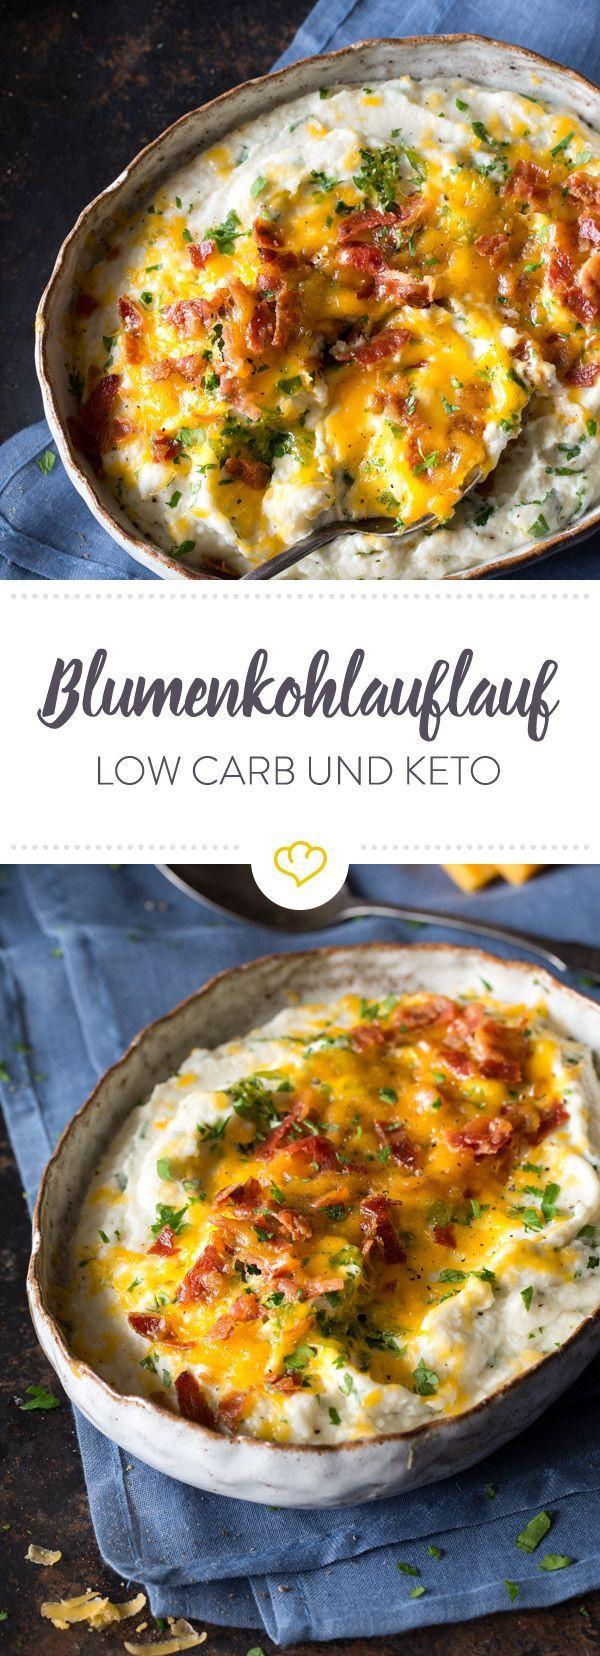 Low Carb Keto Rezepte Deutsch  Low Carb Keto Blumenkohlauflauf Rezept